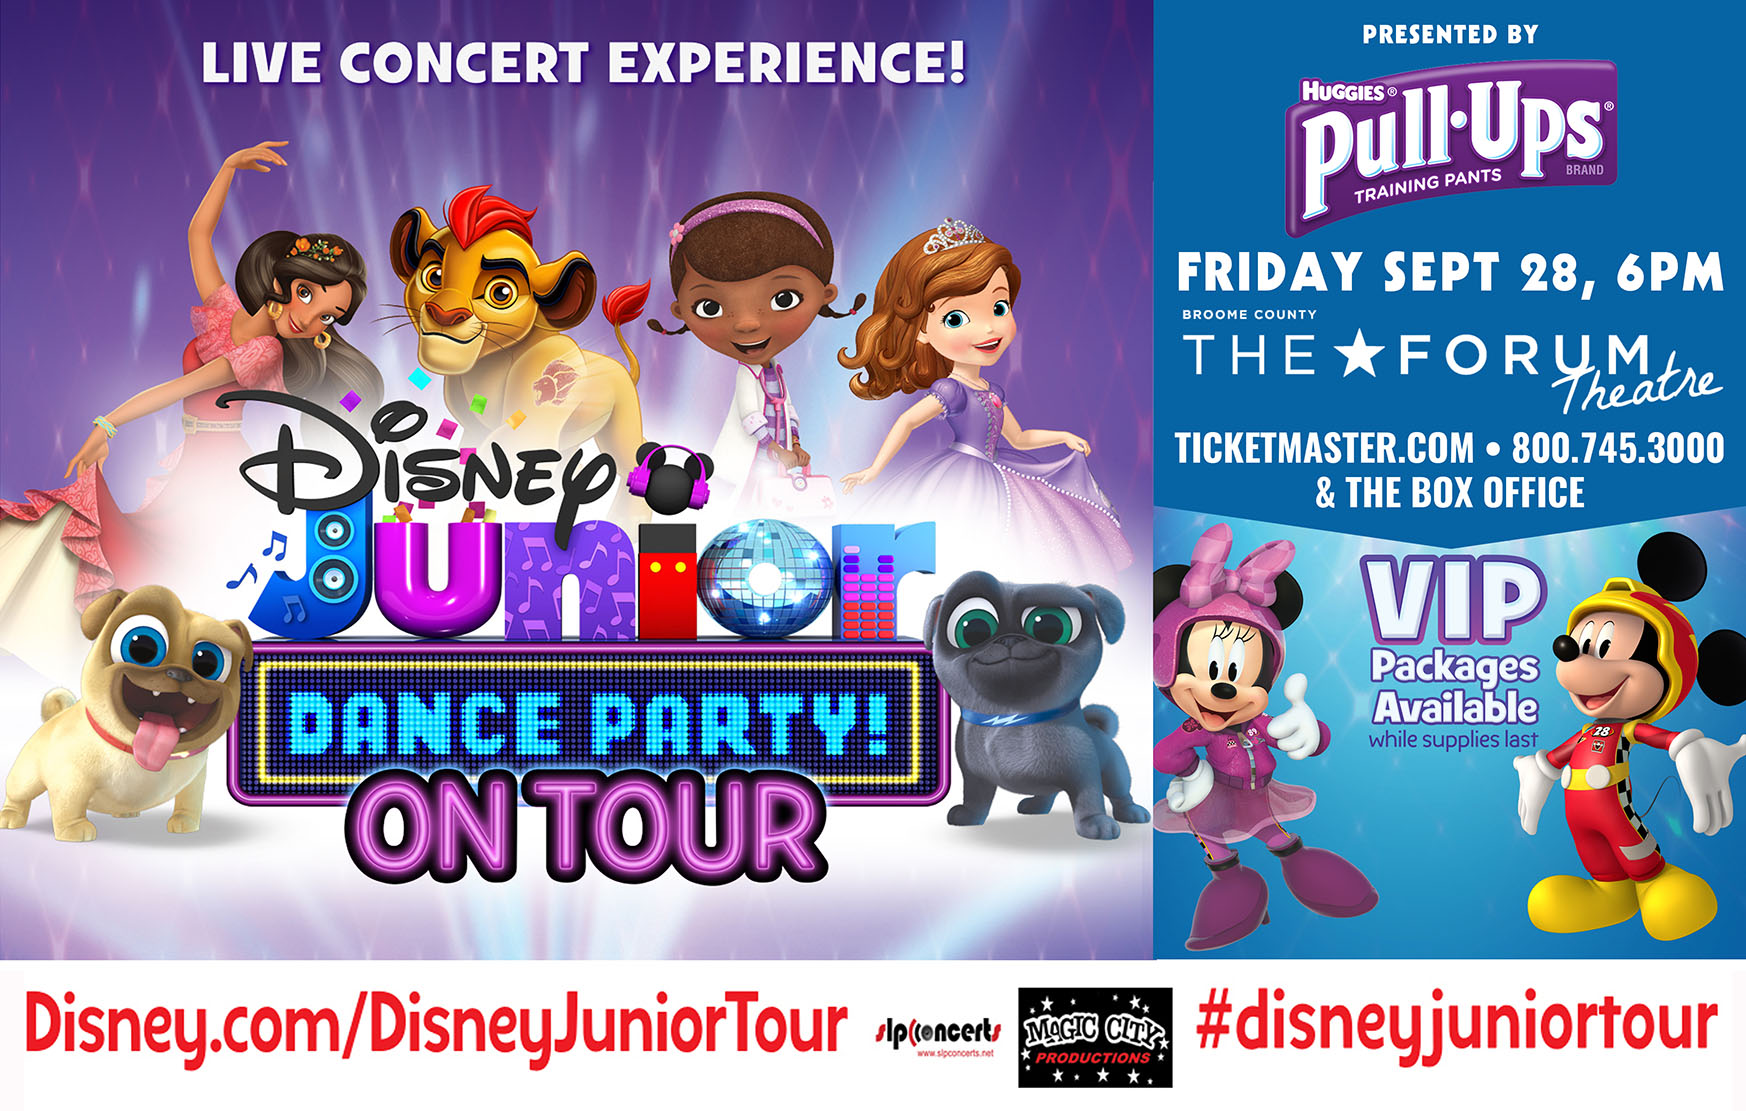 Disney Junior Dance Party On Tour in Binghamton